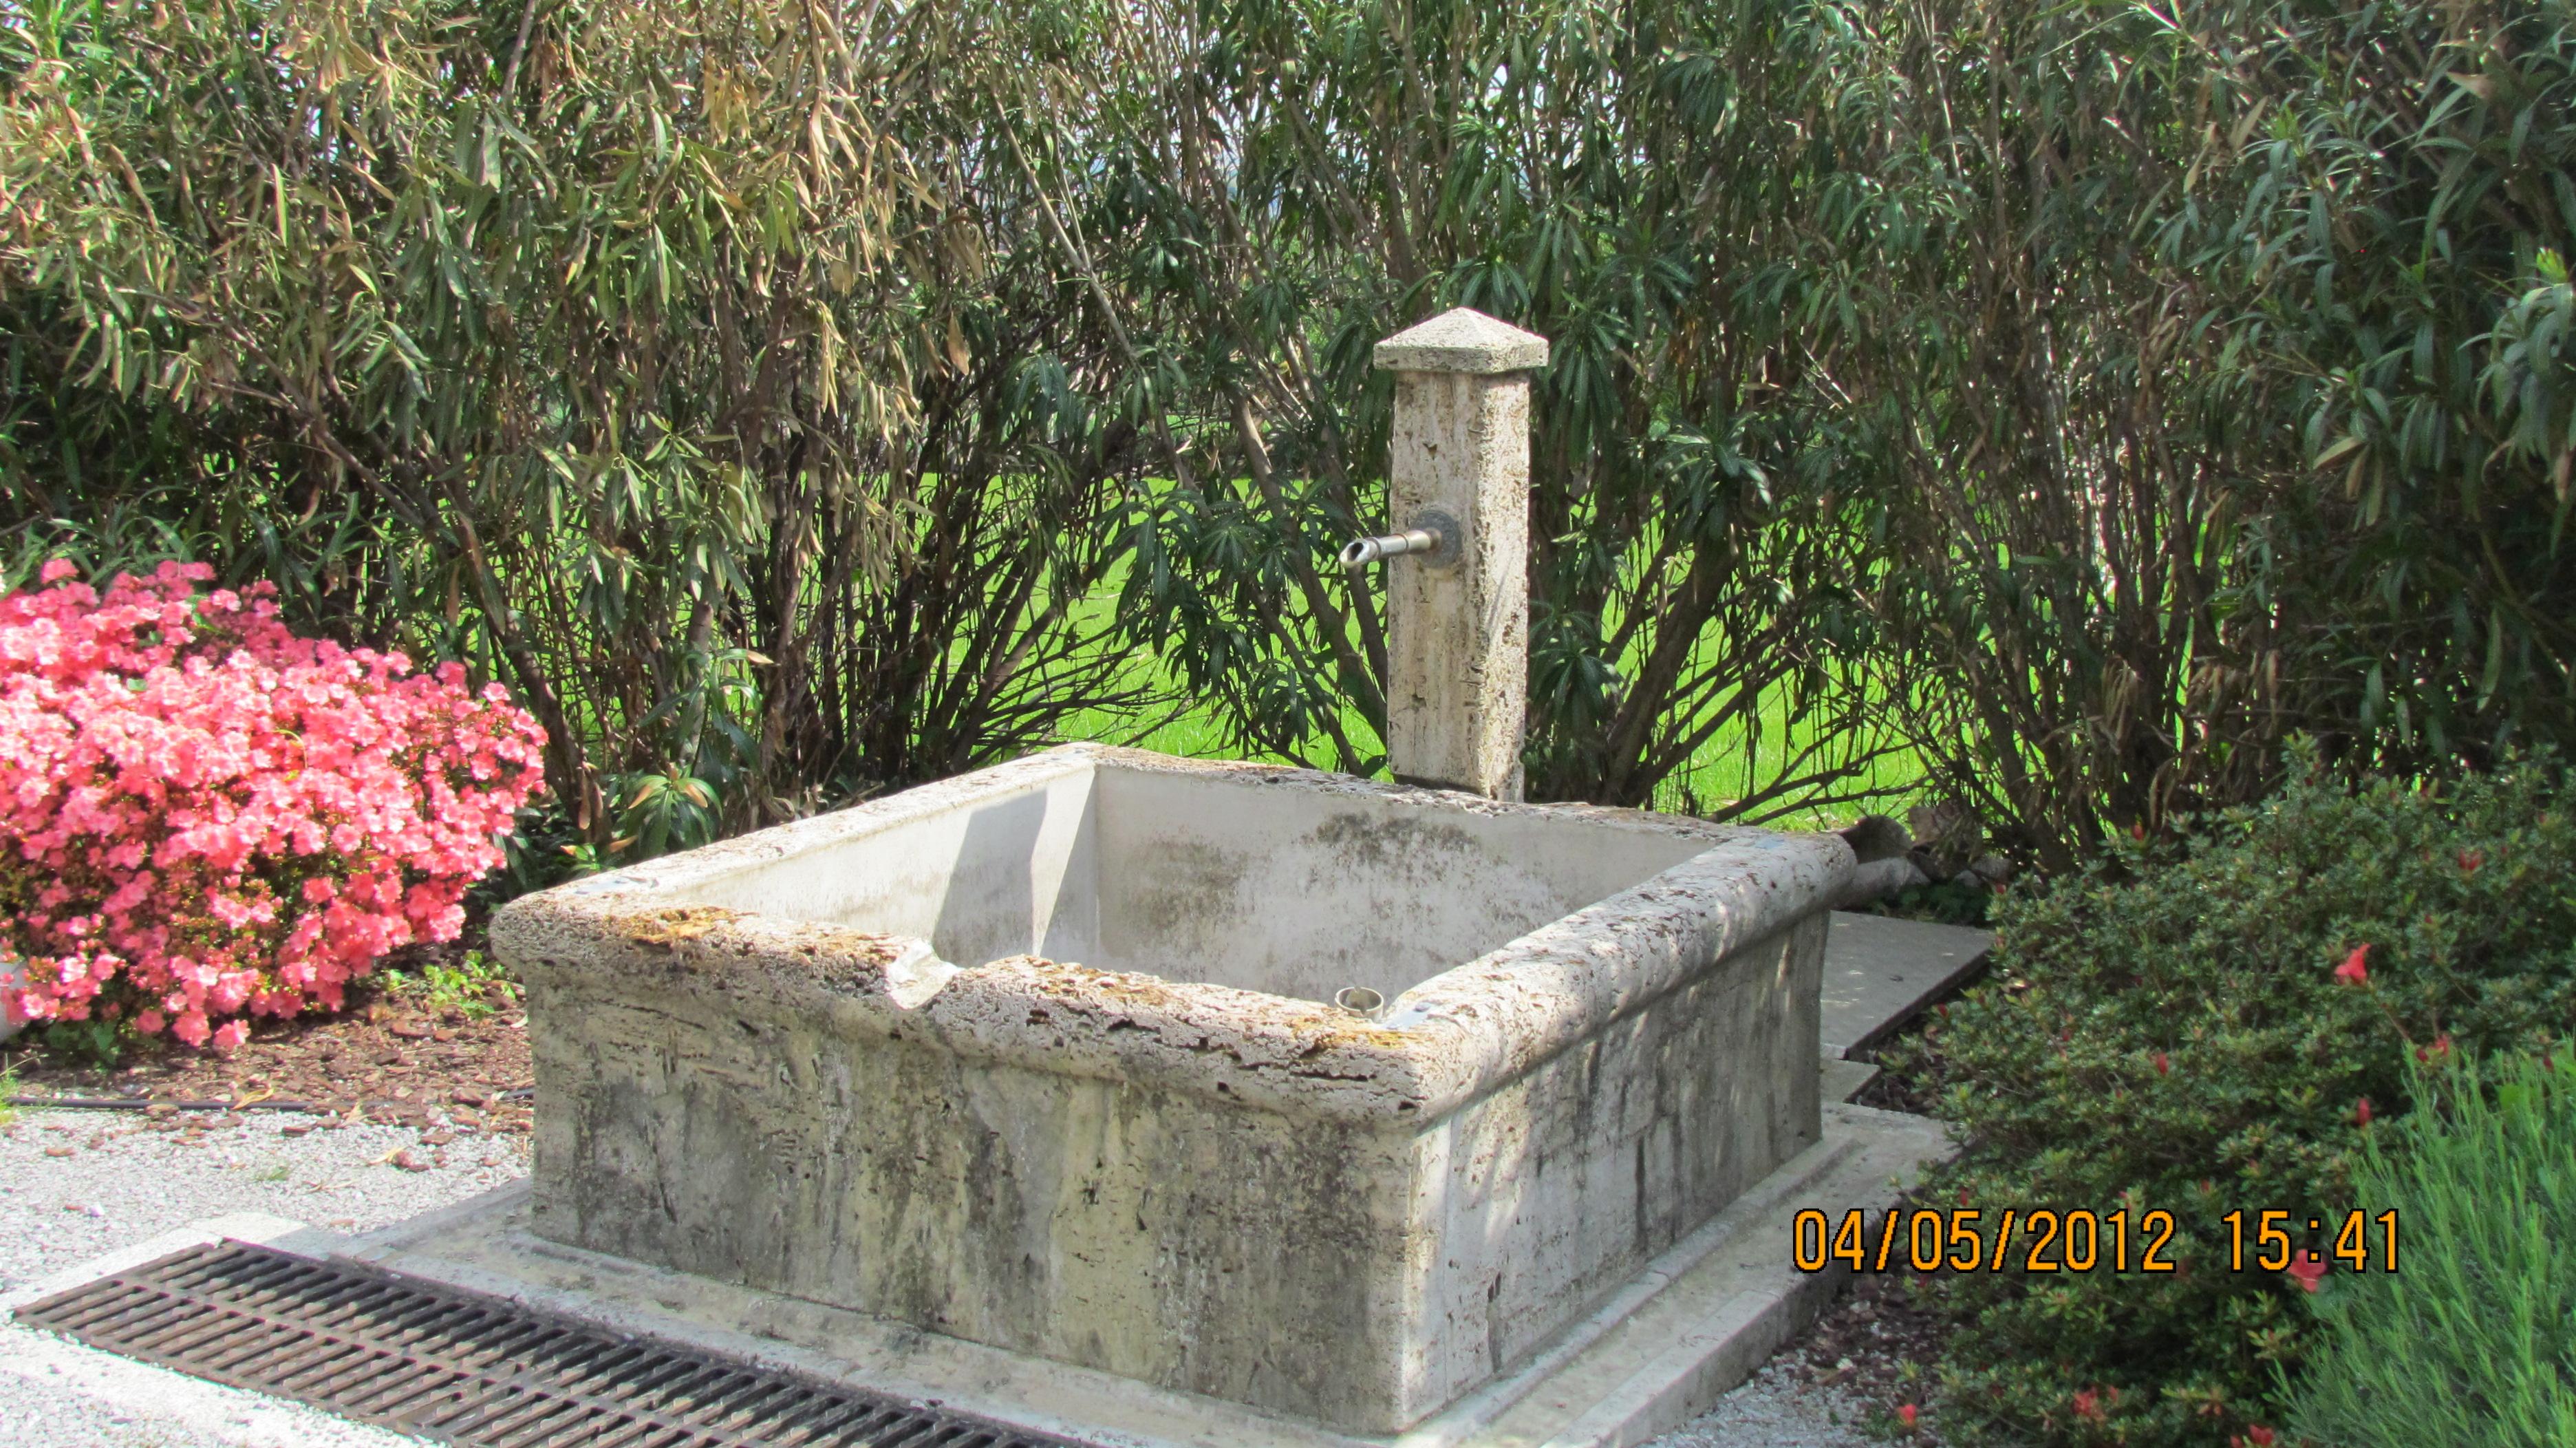 Fontana Giardino Pietra : Fontanella giardino in pietra fontane in pietra naturale prezzi